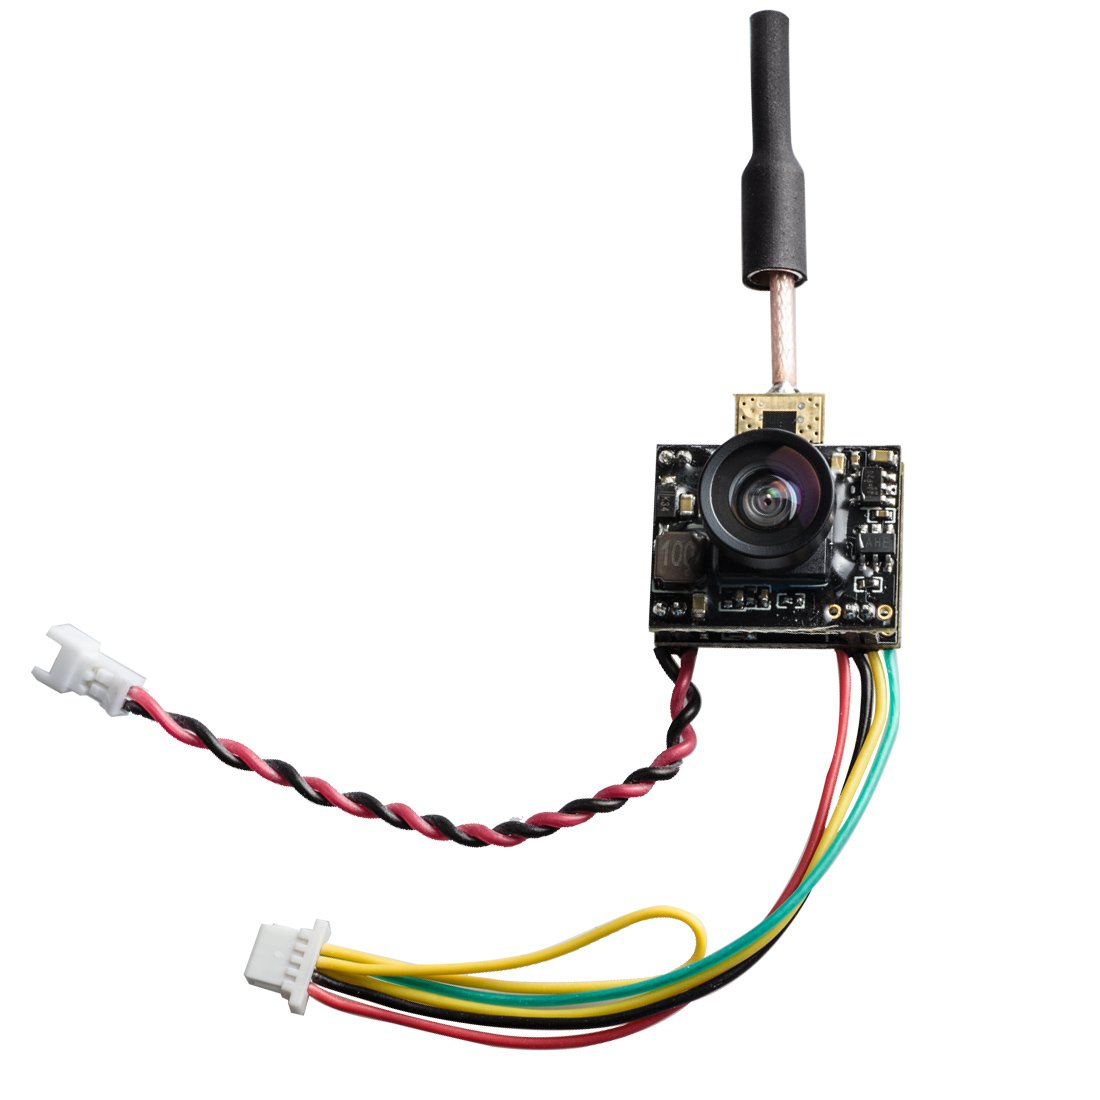 AKK AIO-SA 25mW/50mW/100mW/200mW Switchable 5.8G FPV VTX Micro AIO Camera